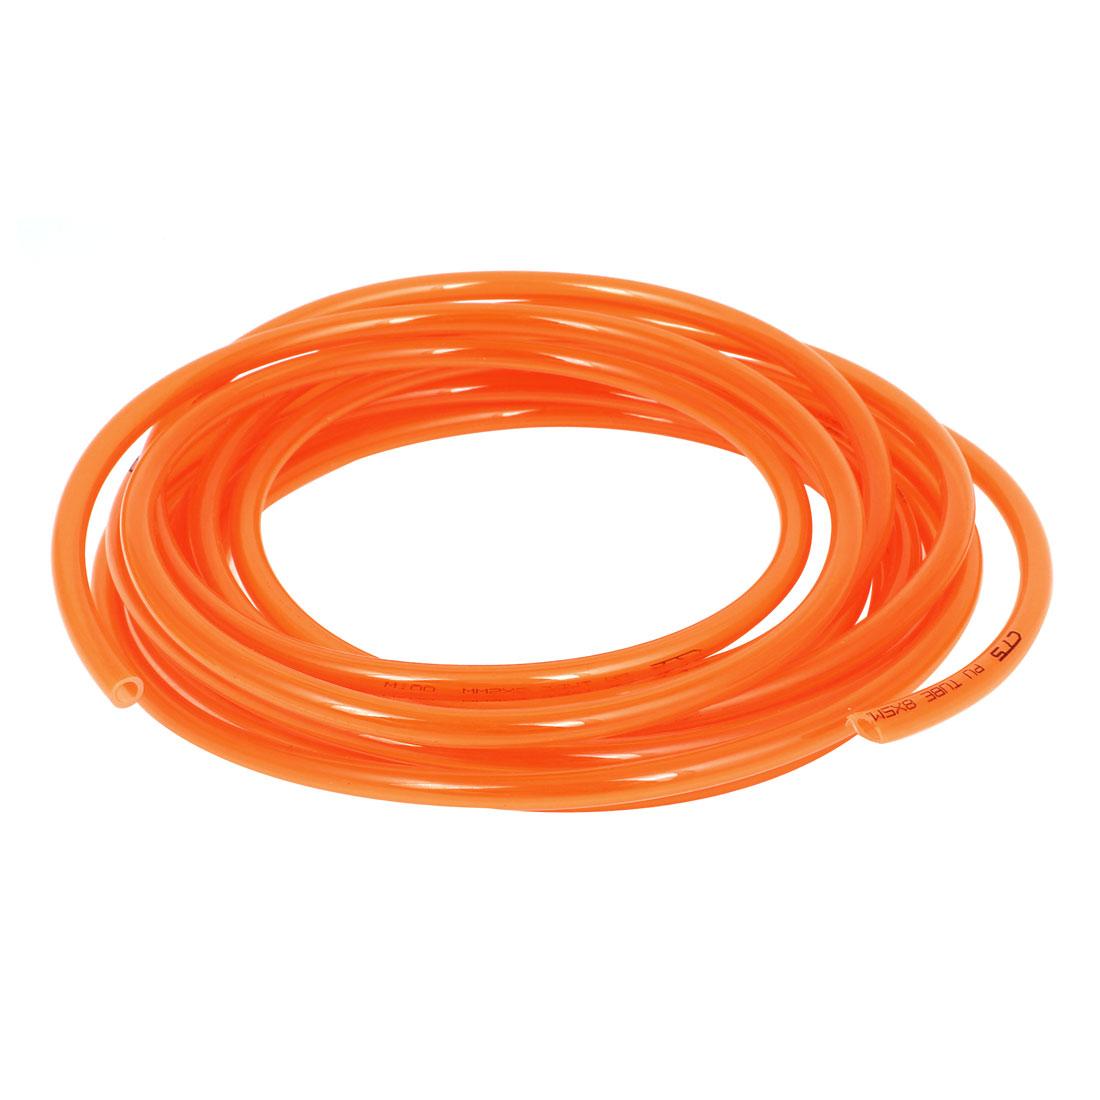 6M Long 8mmx5mm Air Fuel Gas Polyurethane Flexible PU Hose Tube Pipe Orange